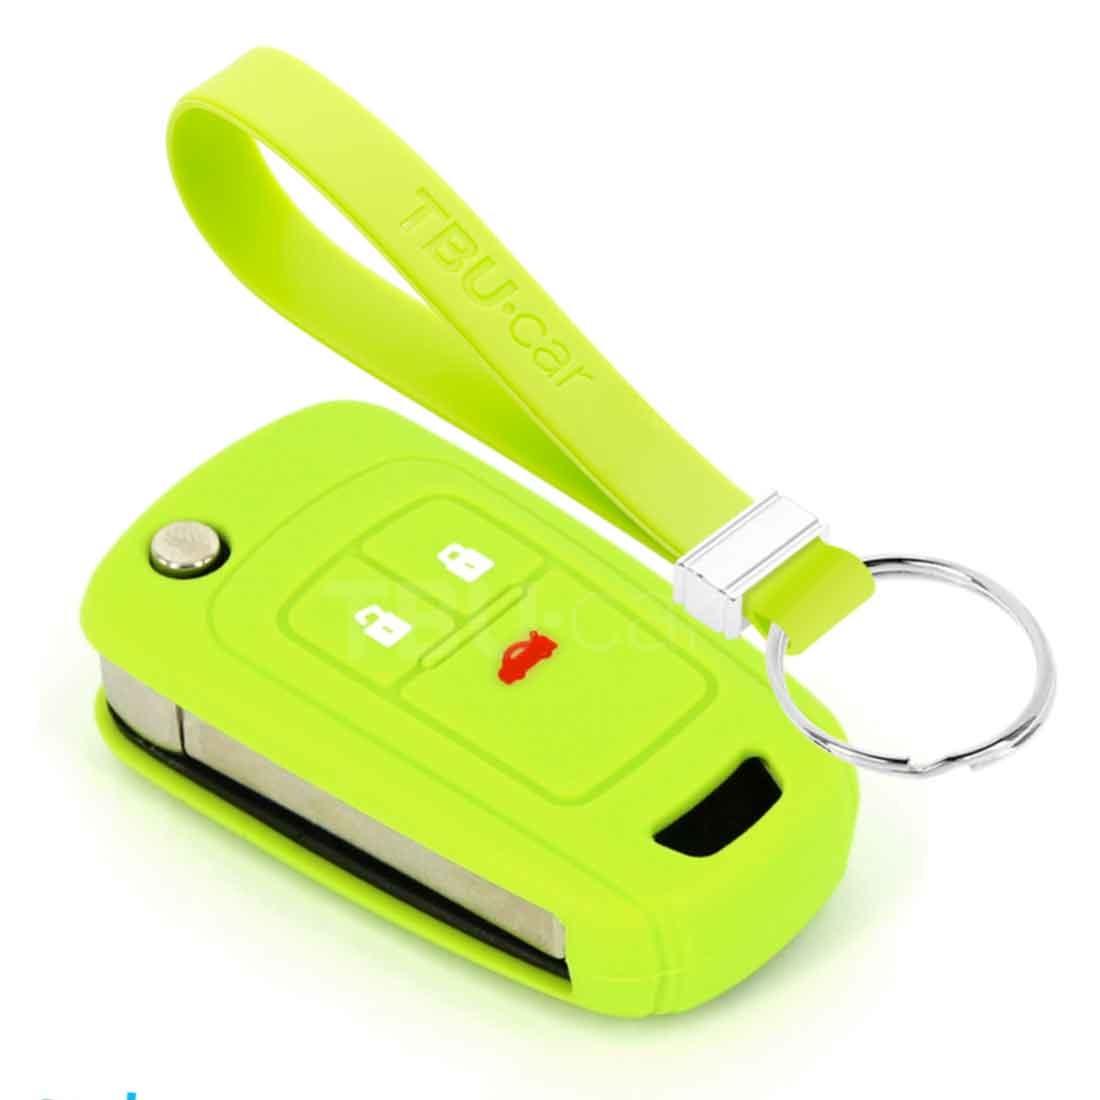 TBU car TBU car Autoschlüssel Hülle kompatibel mit Opel 3 Tasten - Schutzhülle aus Silikon - Auto Schlüsselhülle Cover in Lindgrün